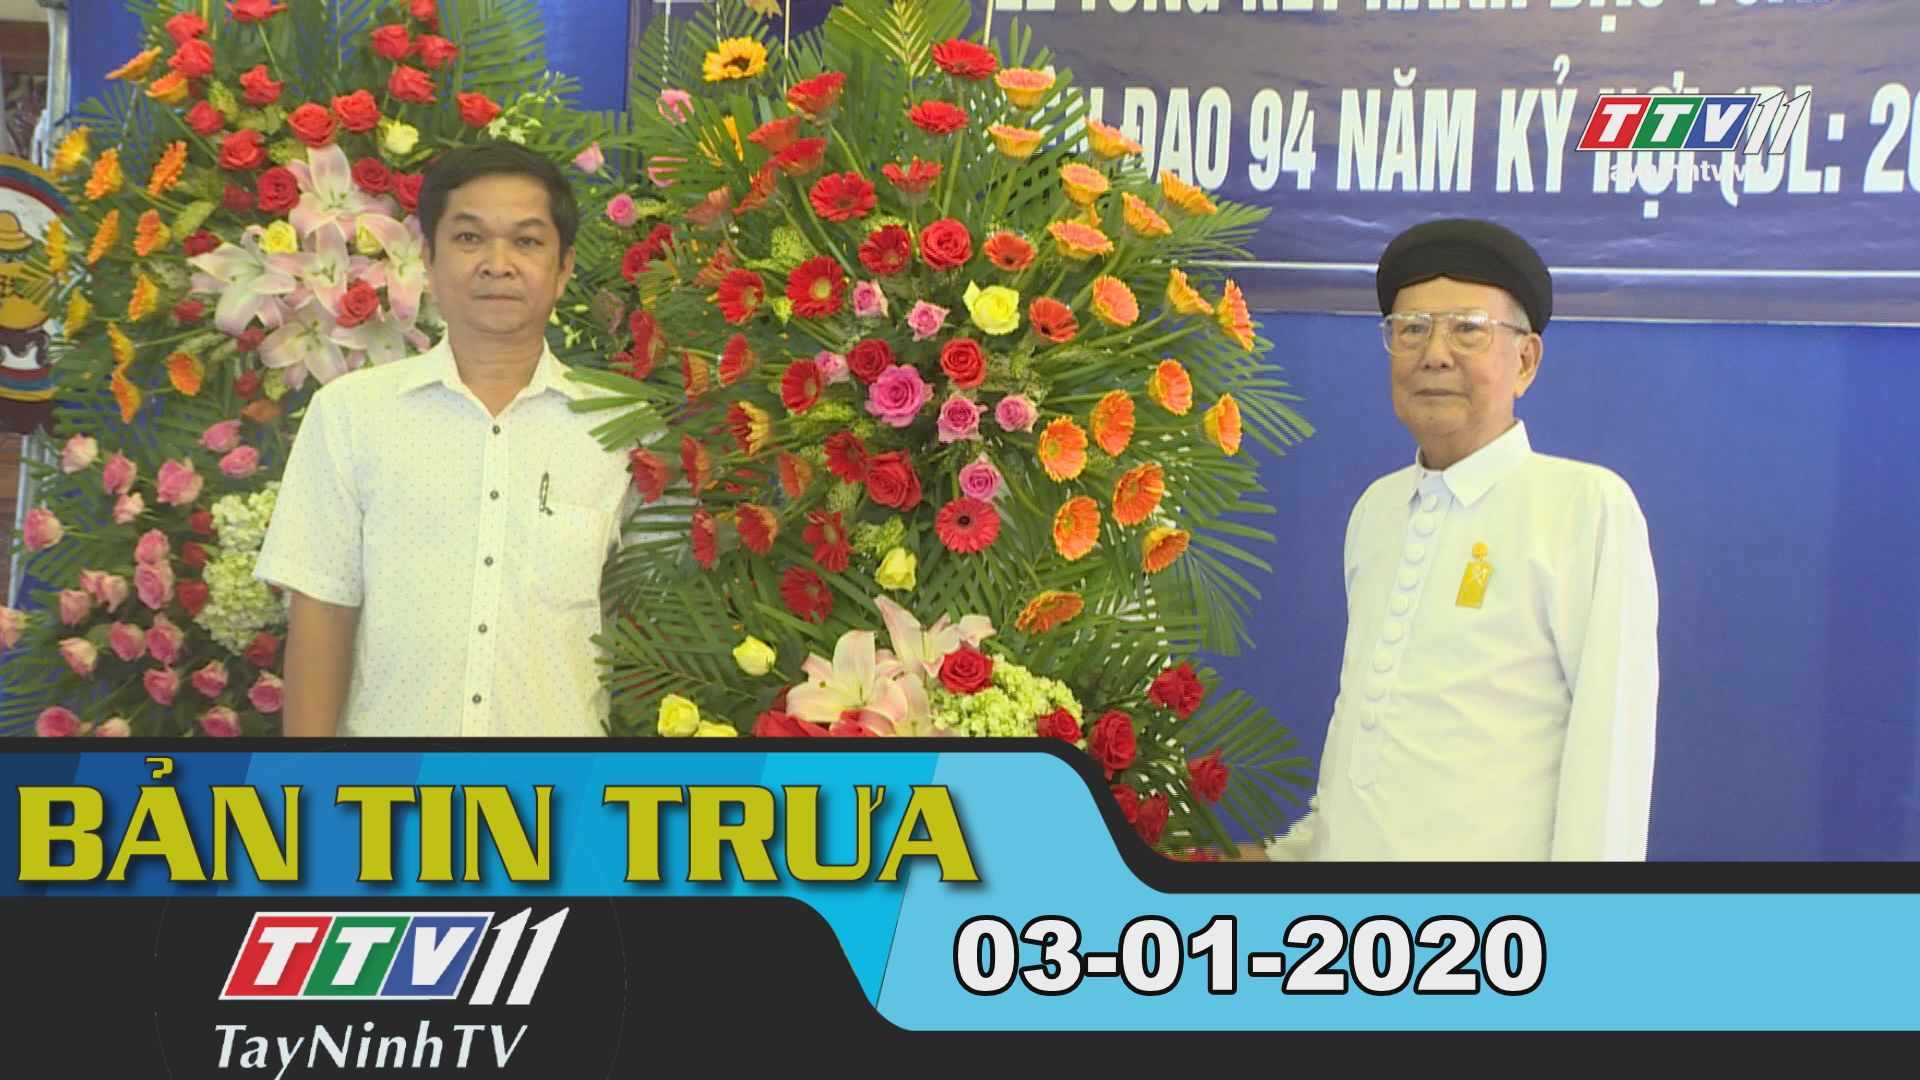 Bản tin trưa 03-01-2020 | Tin tức hôm nay | TayNinhTV